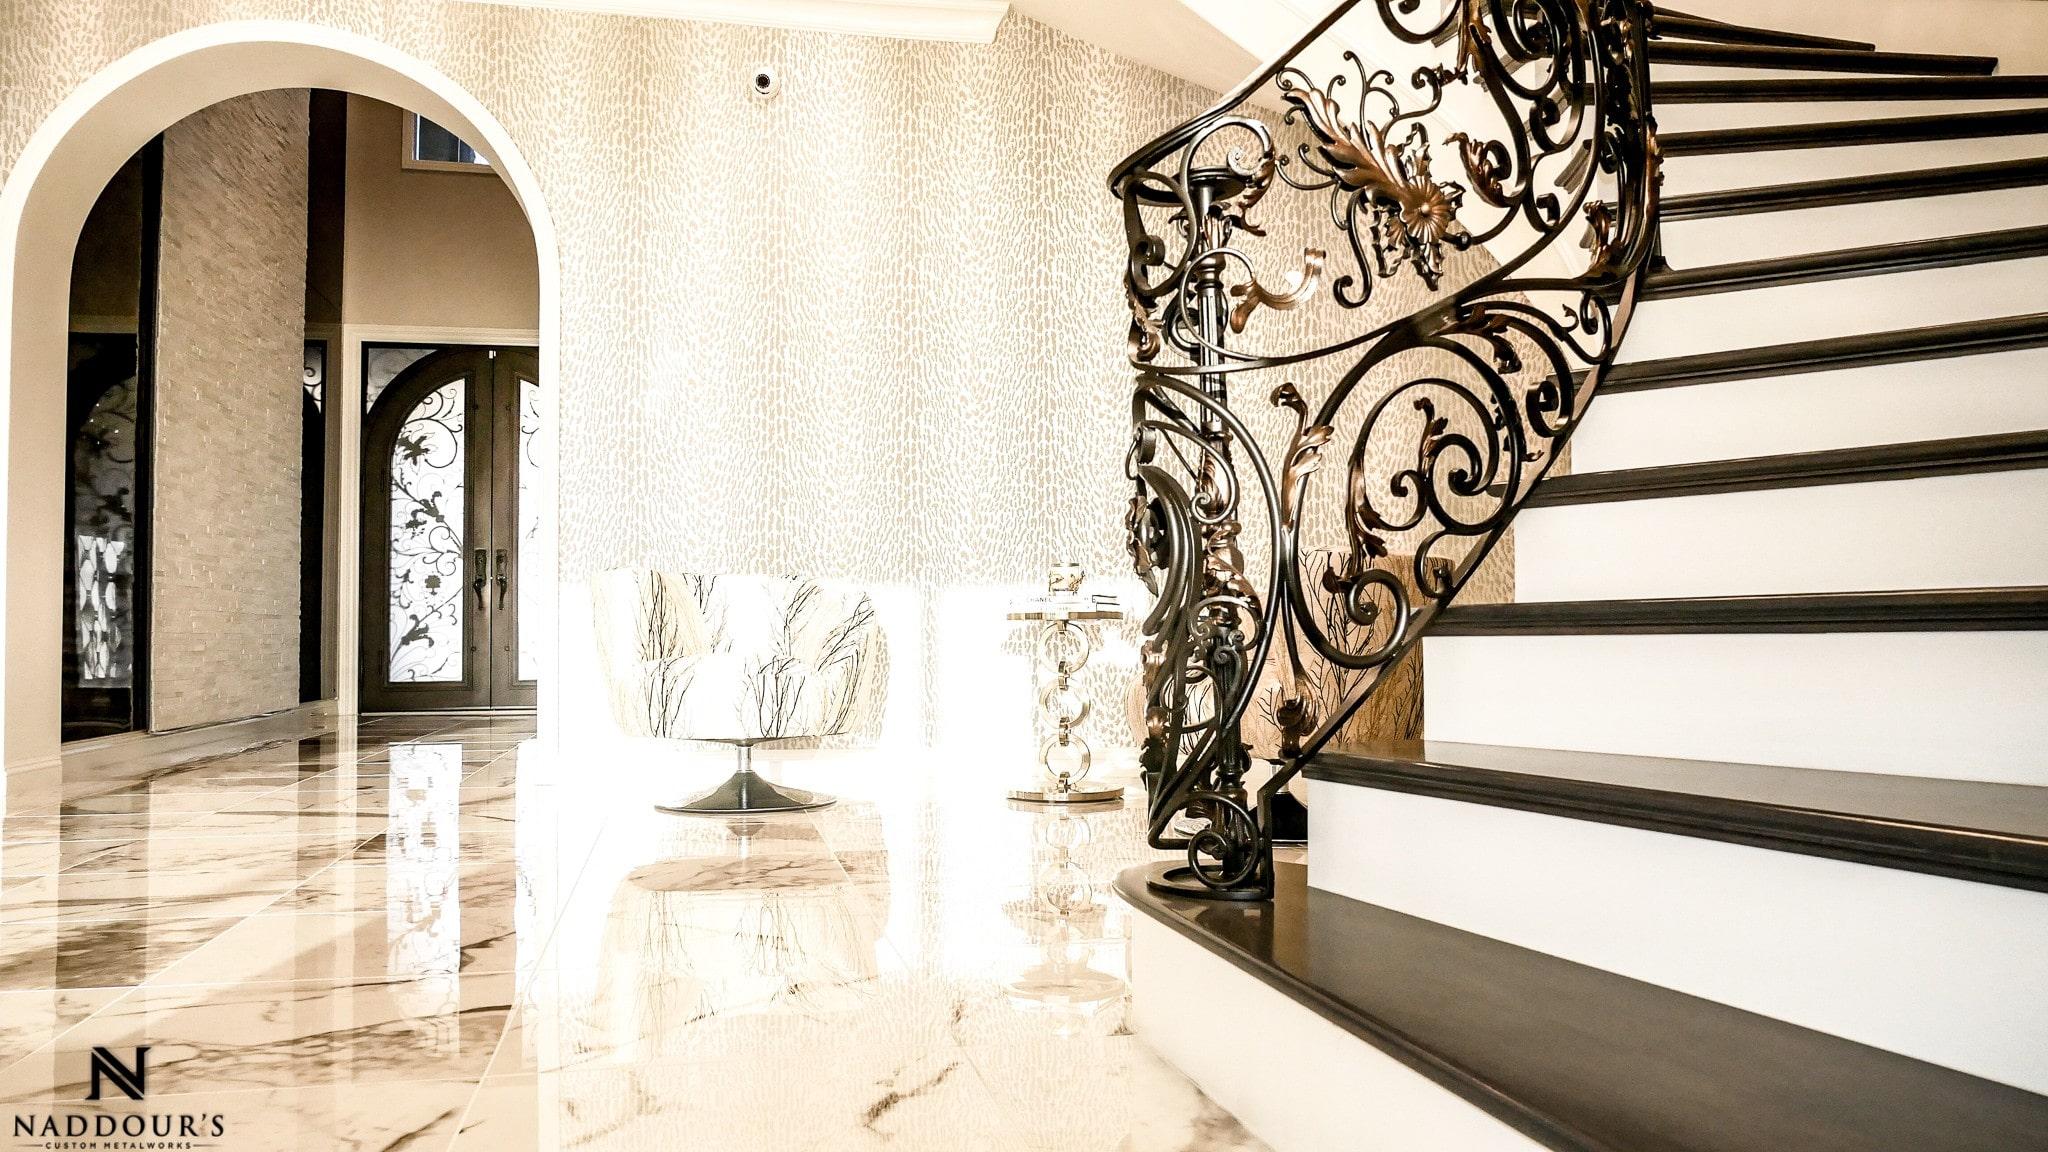 Naddour's Custom Metalworks Custom Staircase Railing Featured Project in Portola Hilla California .jpg 5.jpg